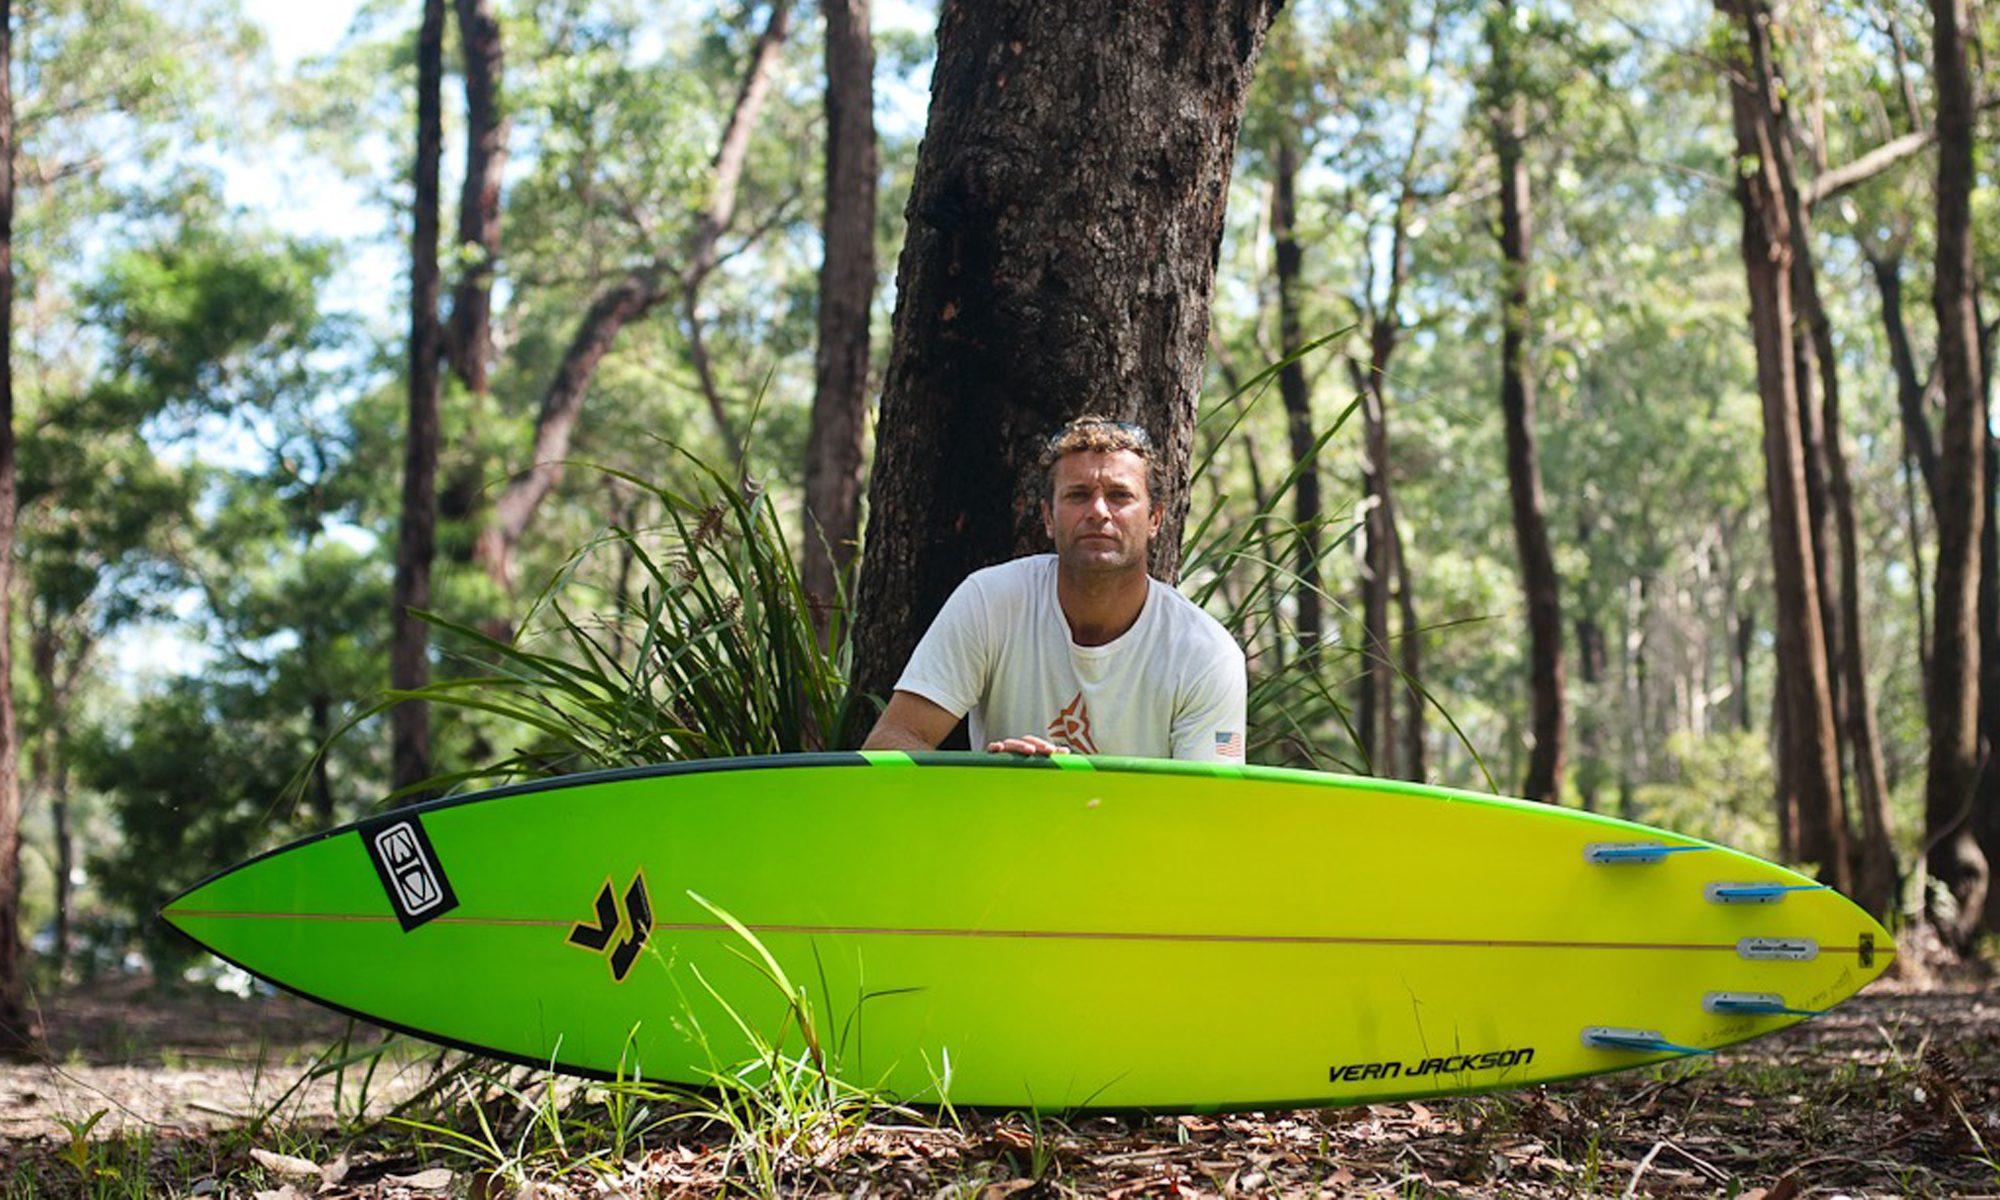 Vern Jackson Surfboards